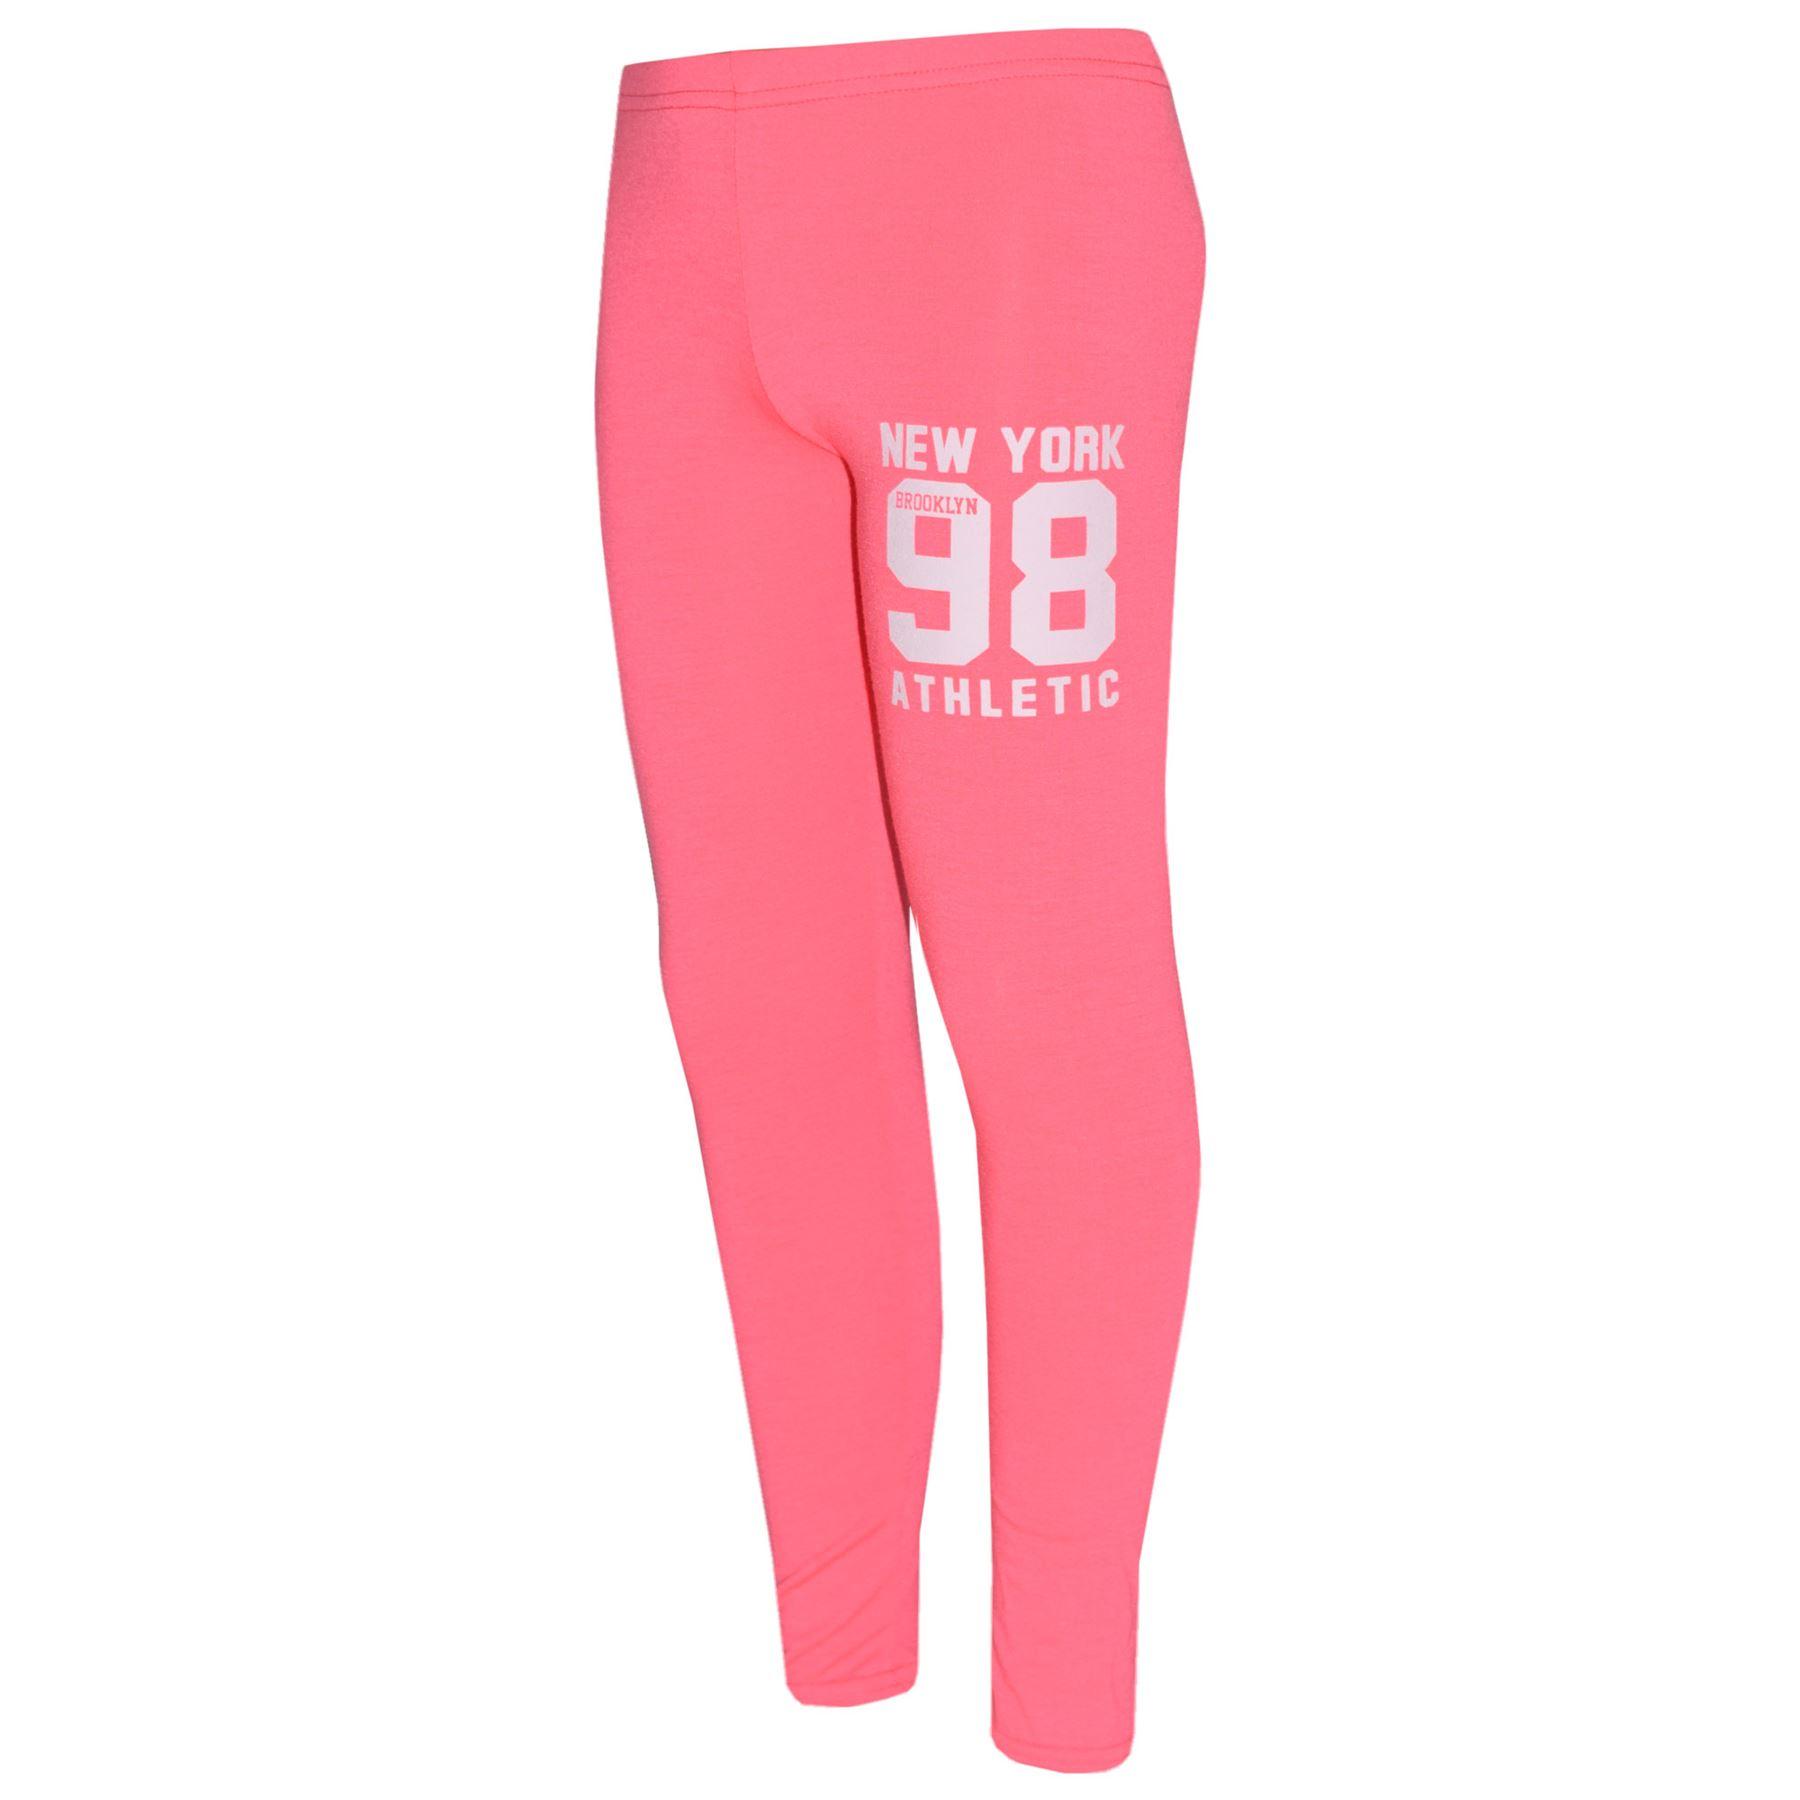 Girls-NEW-YORK-BROOKLYN-98-ATHLECTIC-Camouflage-Print-Top-amp-Legging-Set-7-13-Yr thumbnail 70